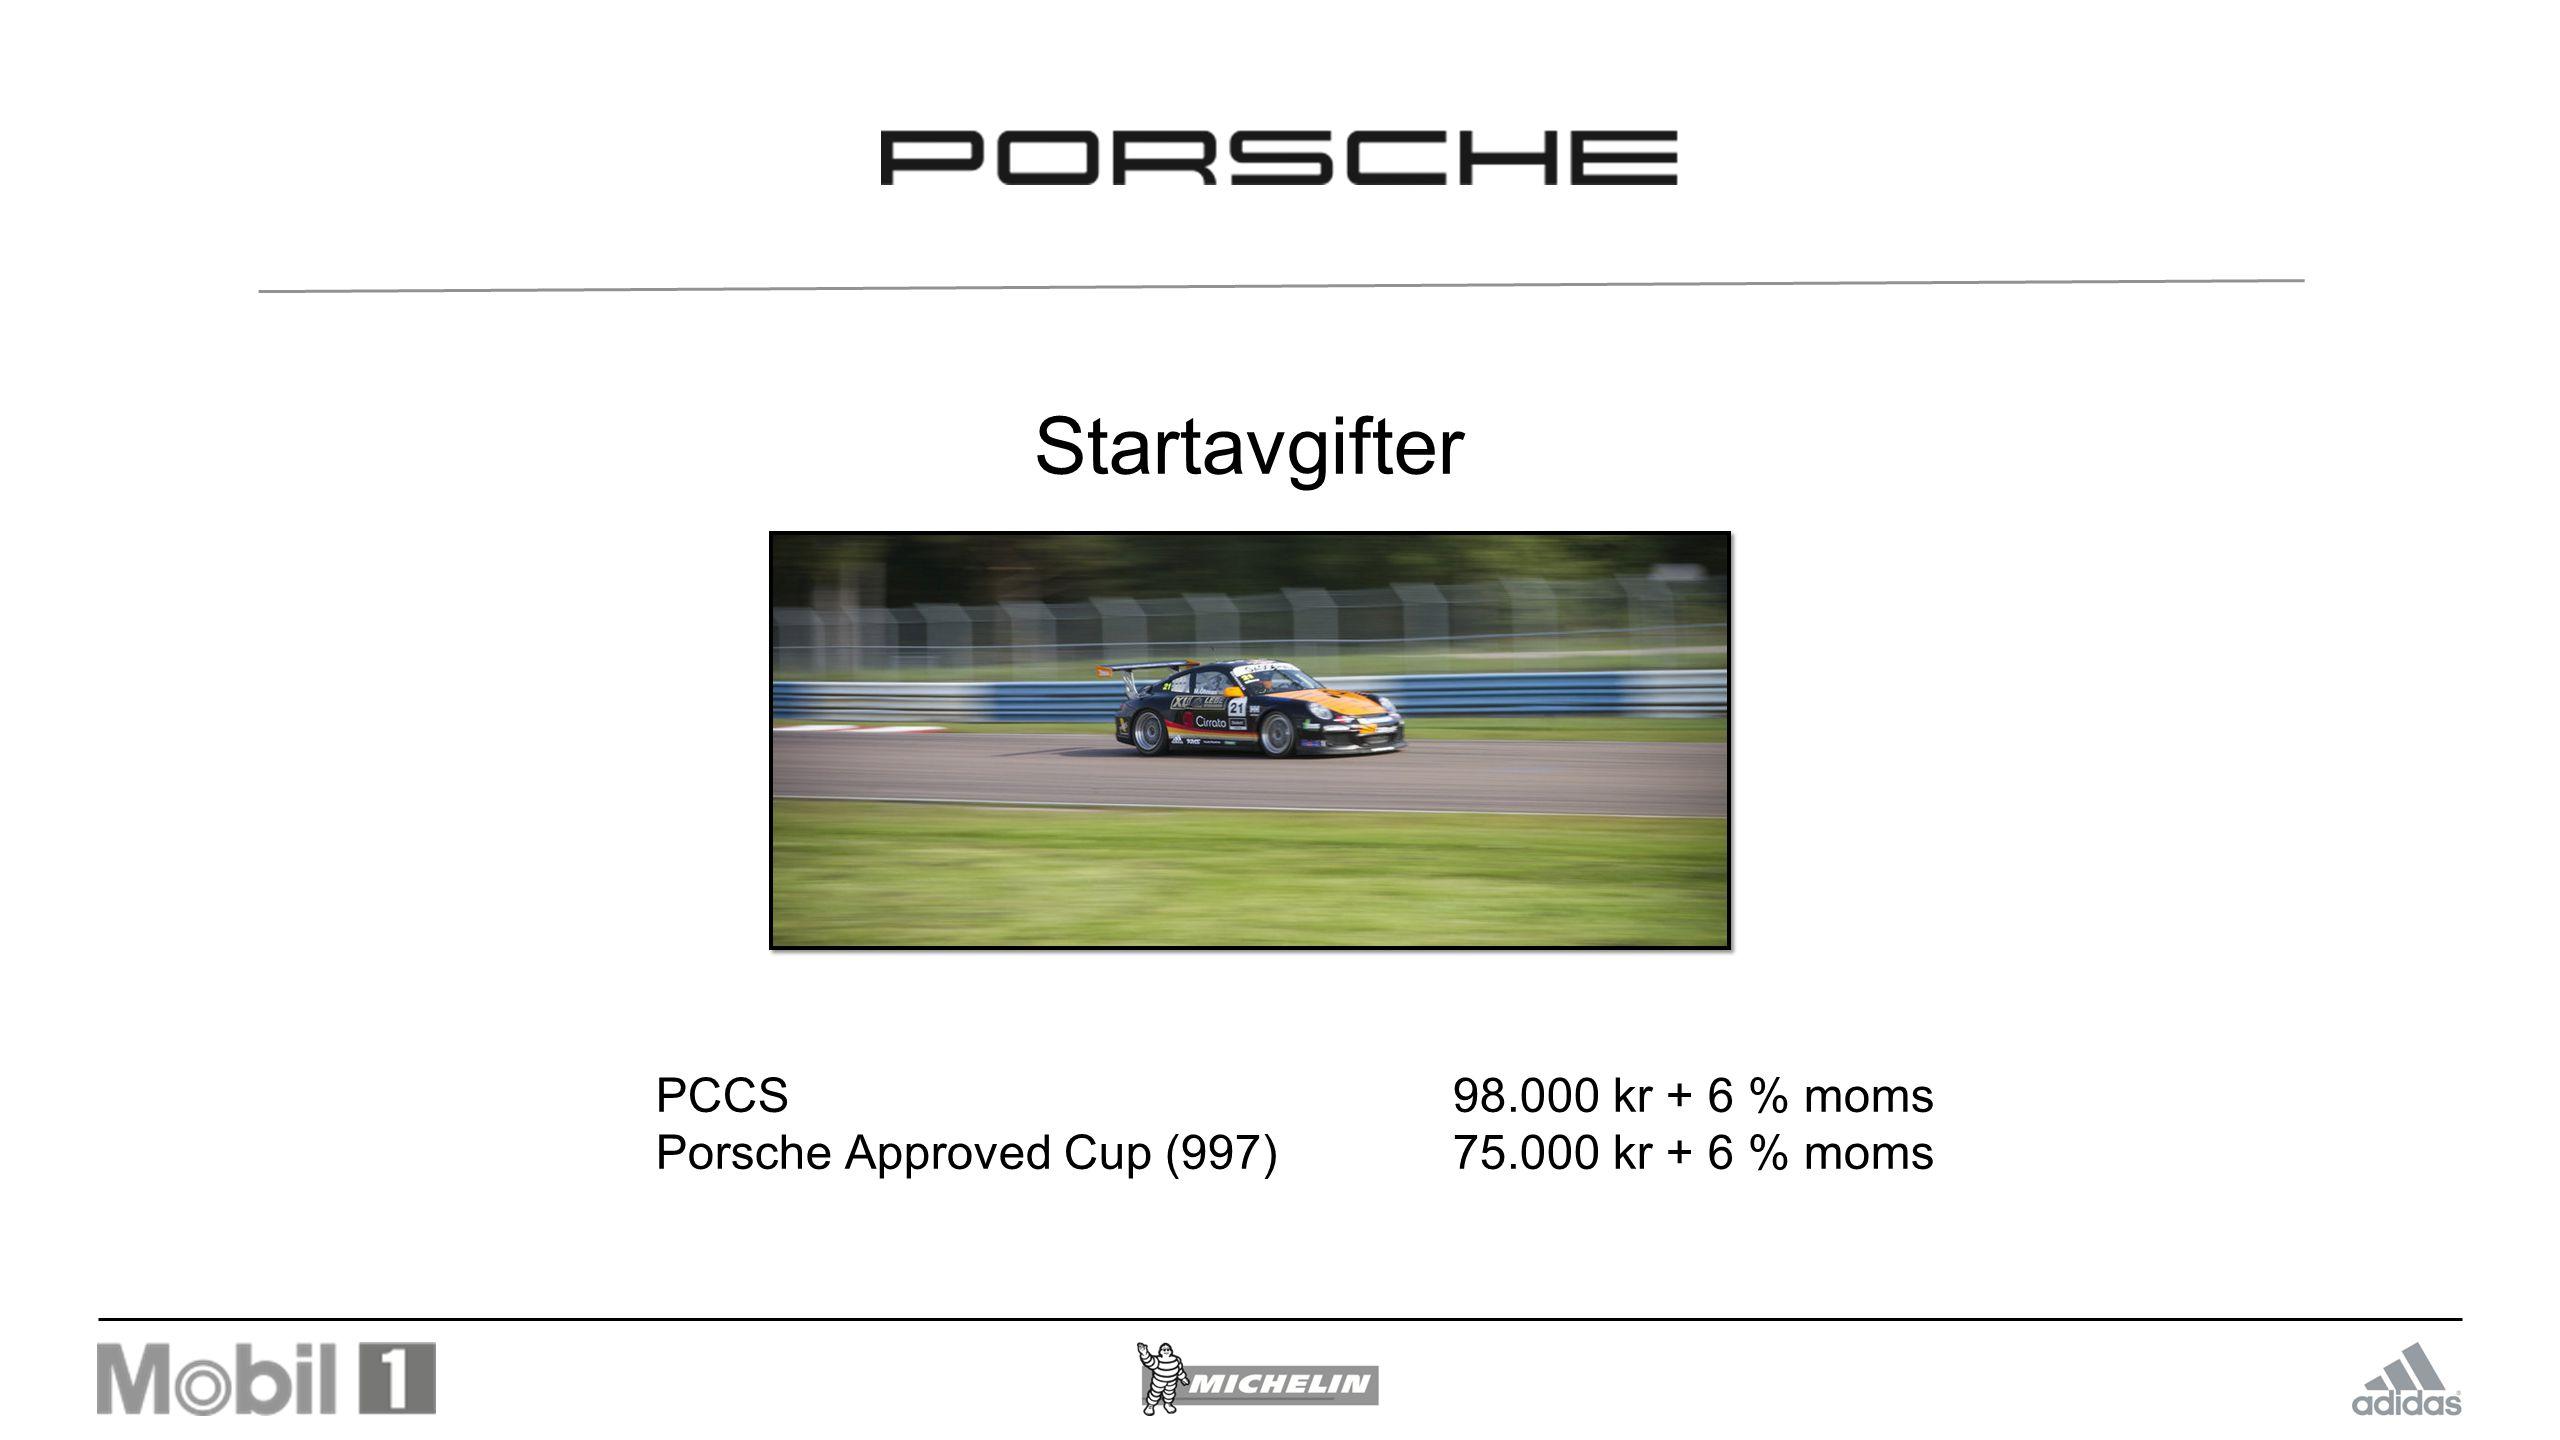 Startavgifter PCCS 98.000 kr + 6 % moms